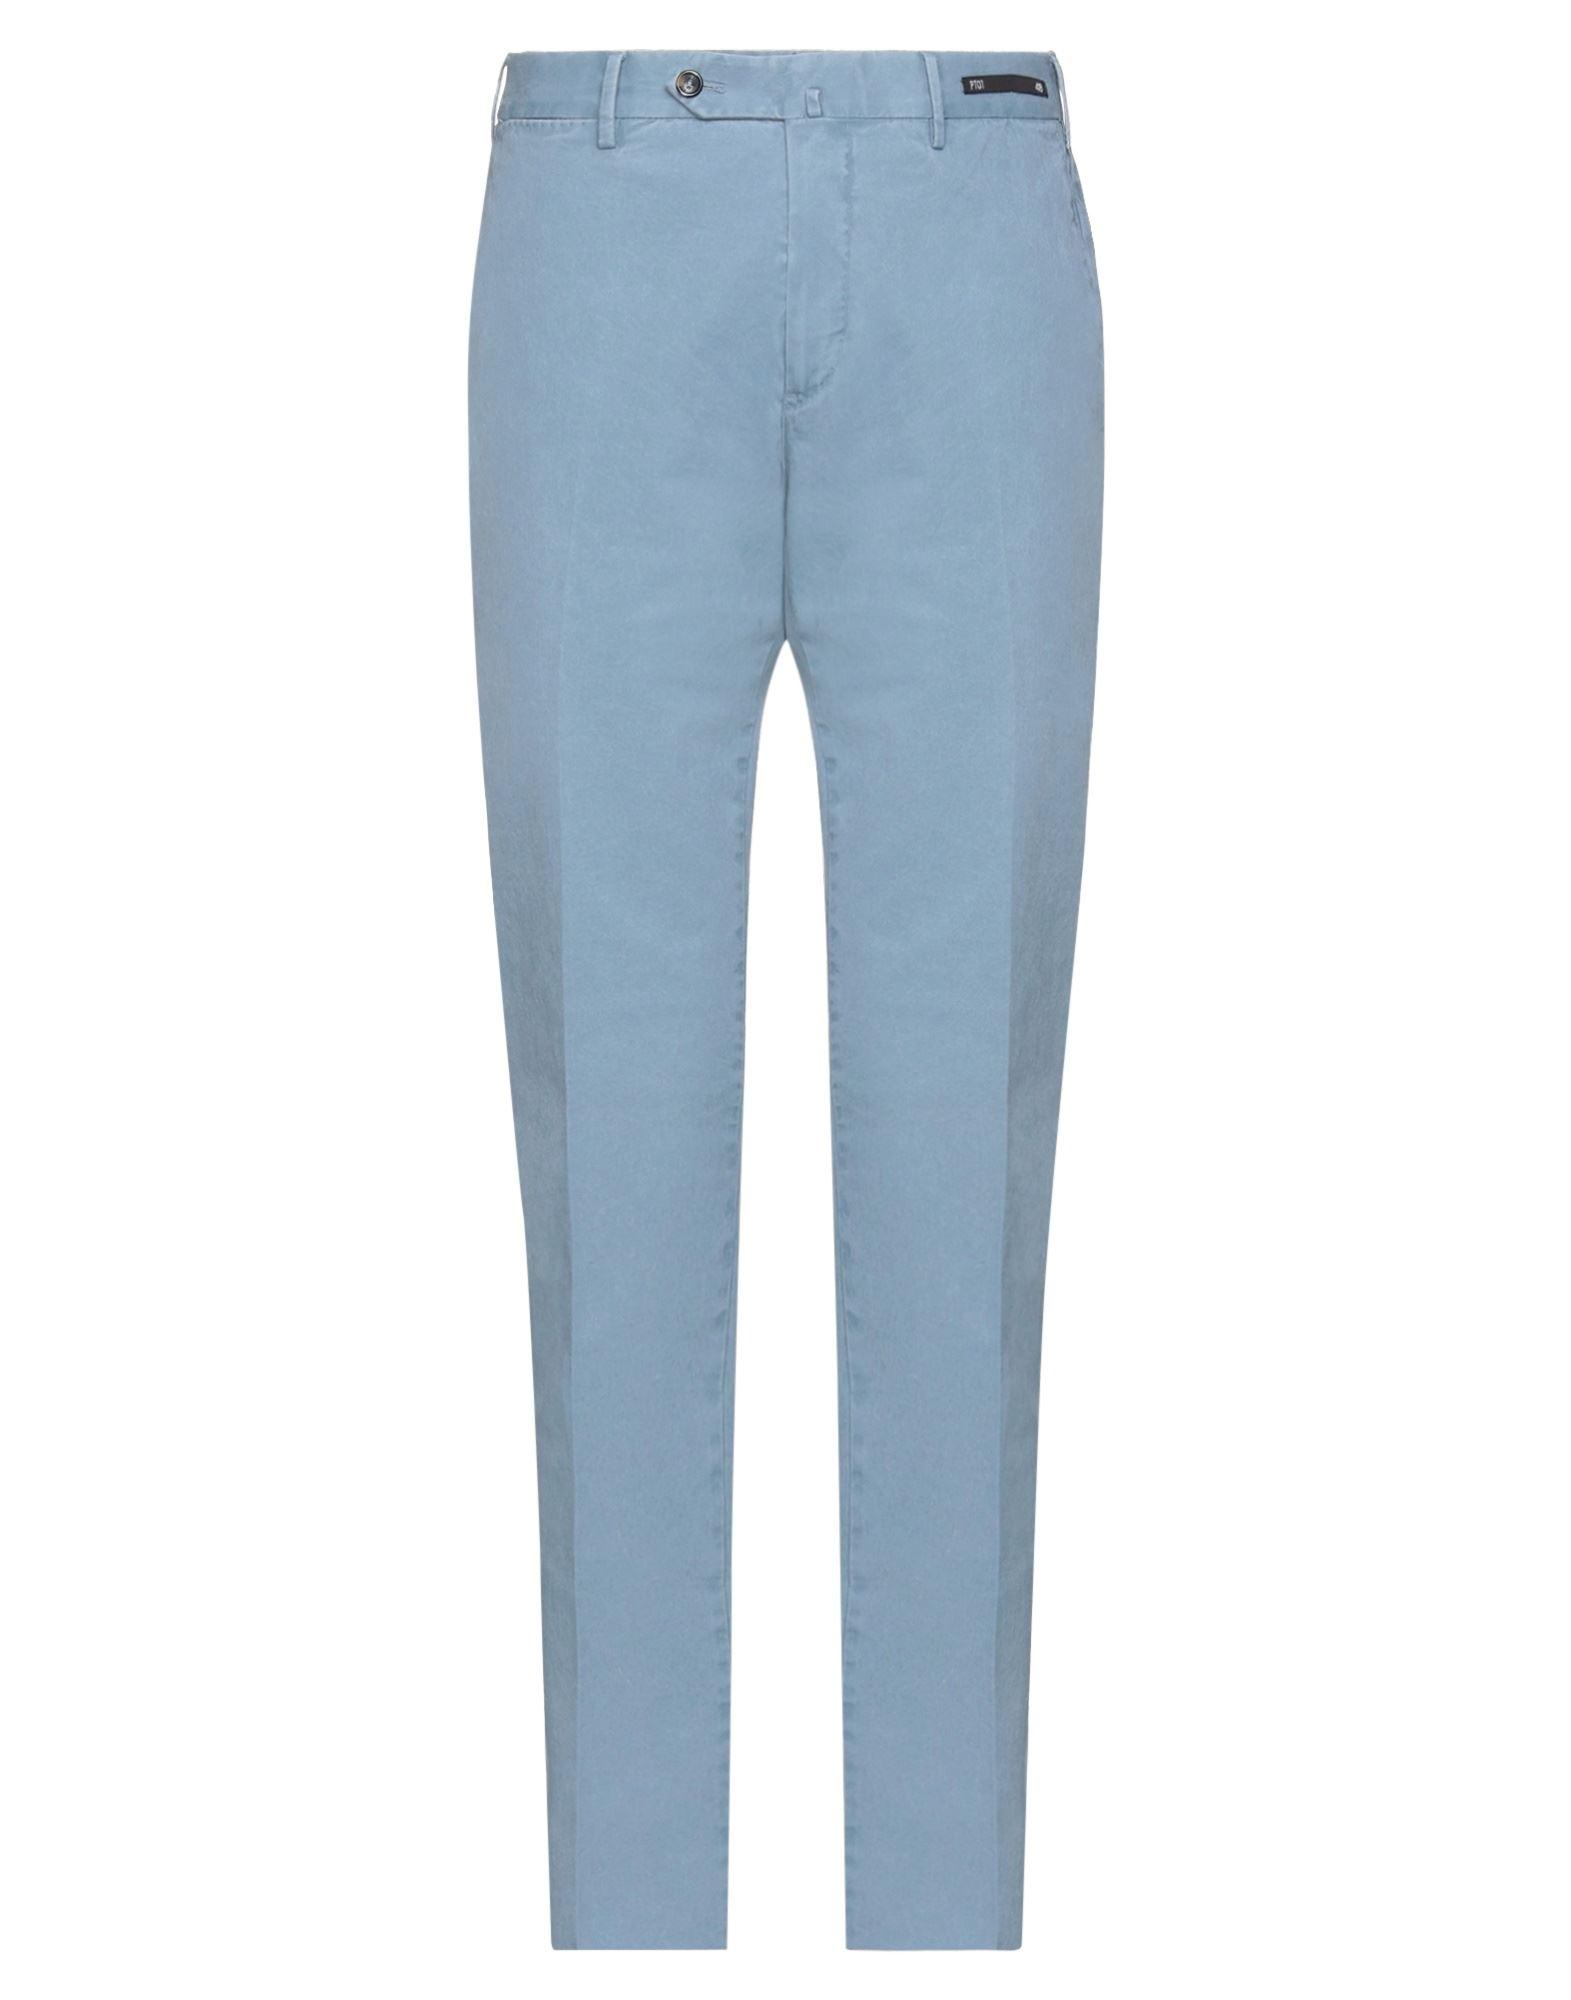 Pt Torino Casual Pants In Slate Blue